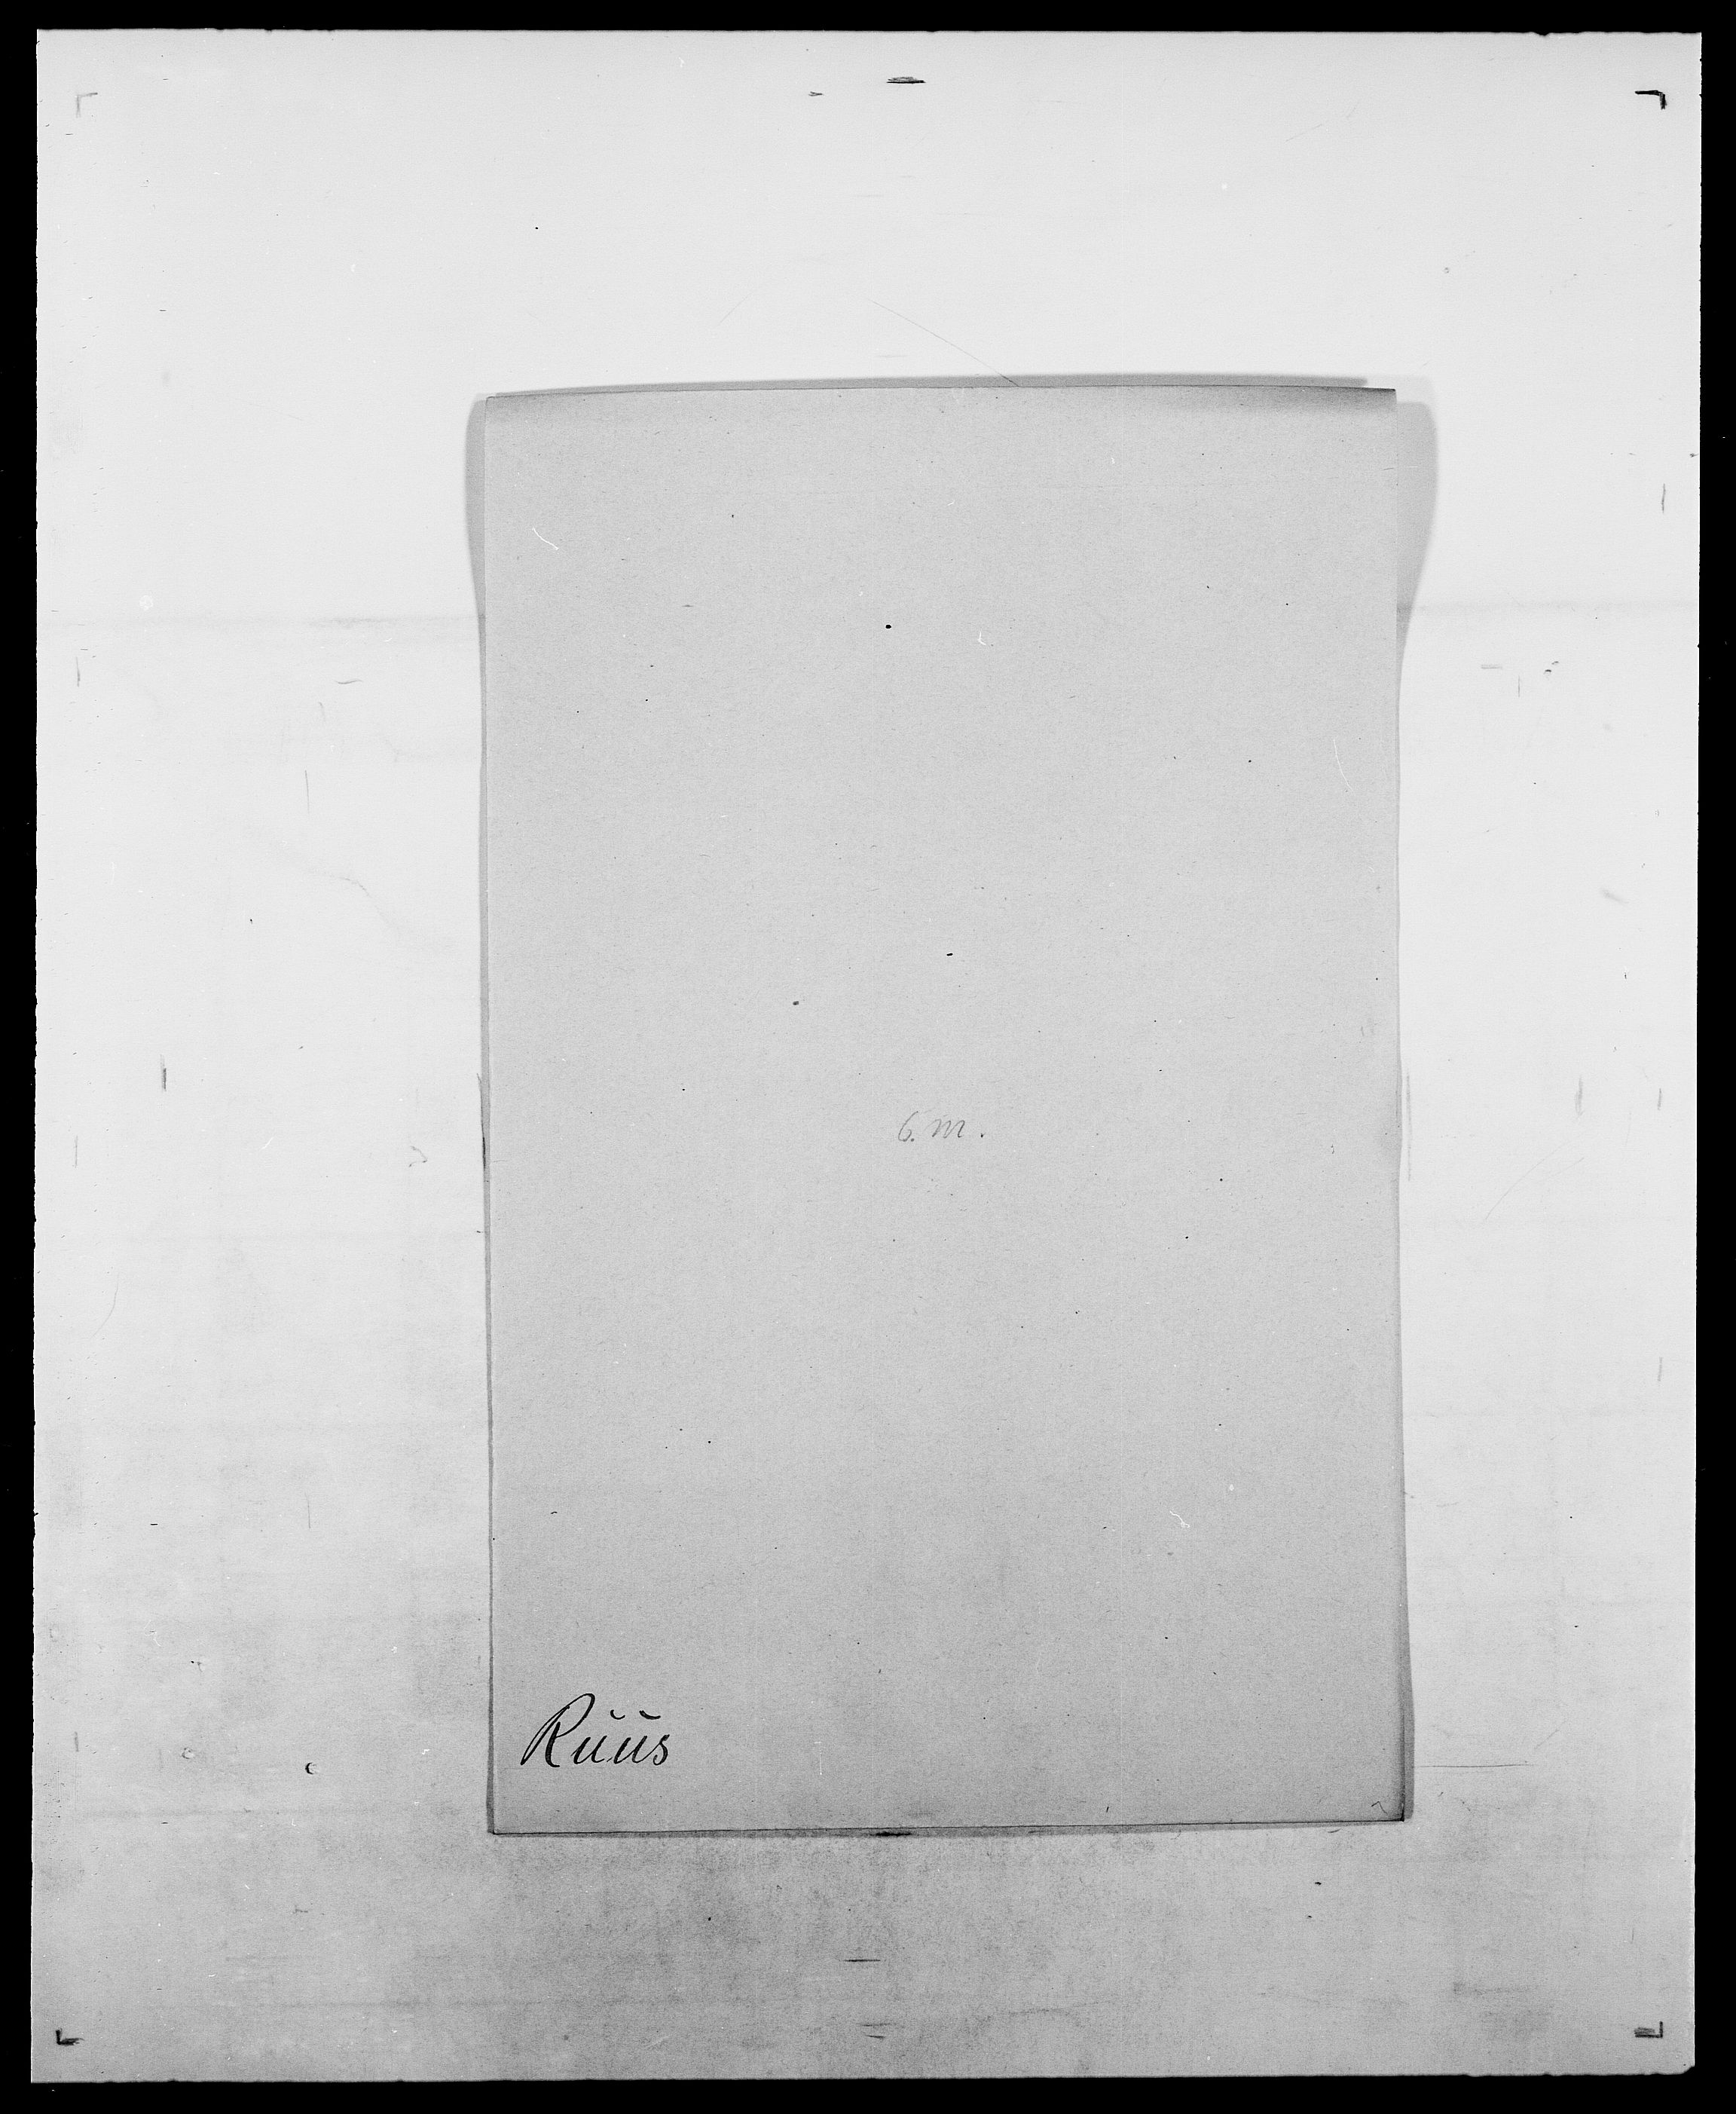 SAO, Delgobe, Charles Antoine - samling, D/Da/L0033: Roald - Røyem, s. 505